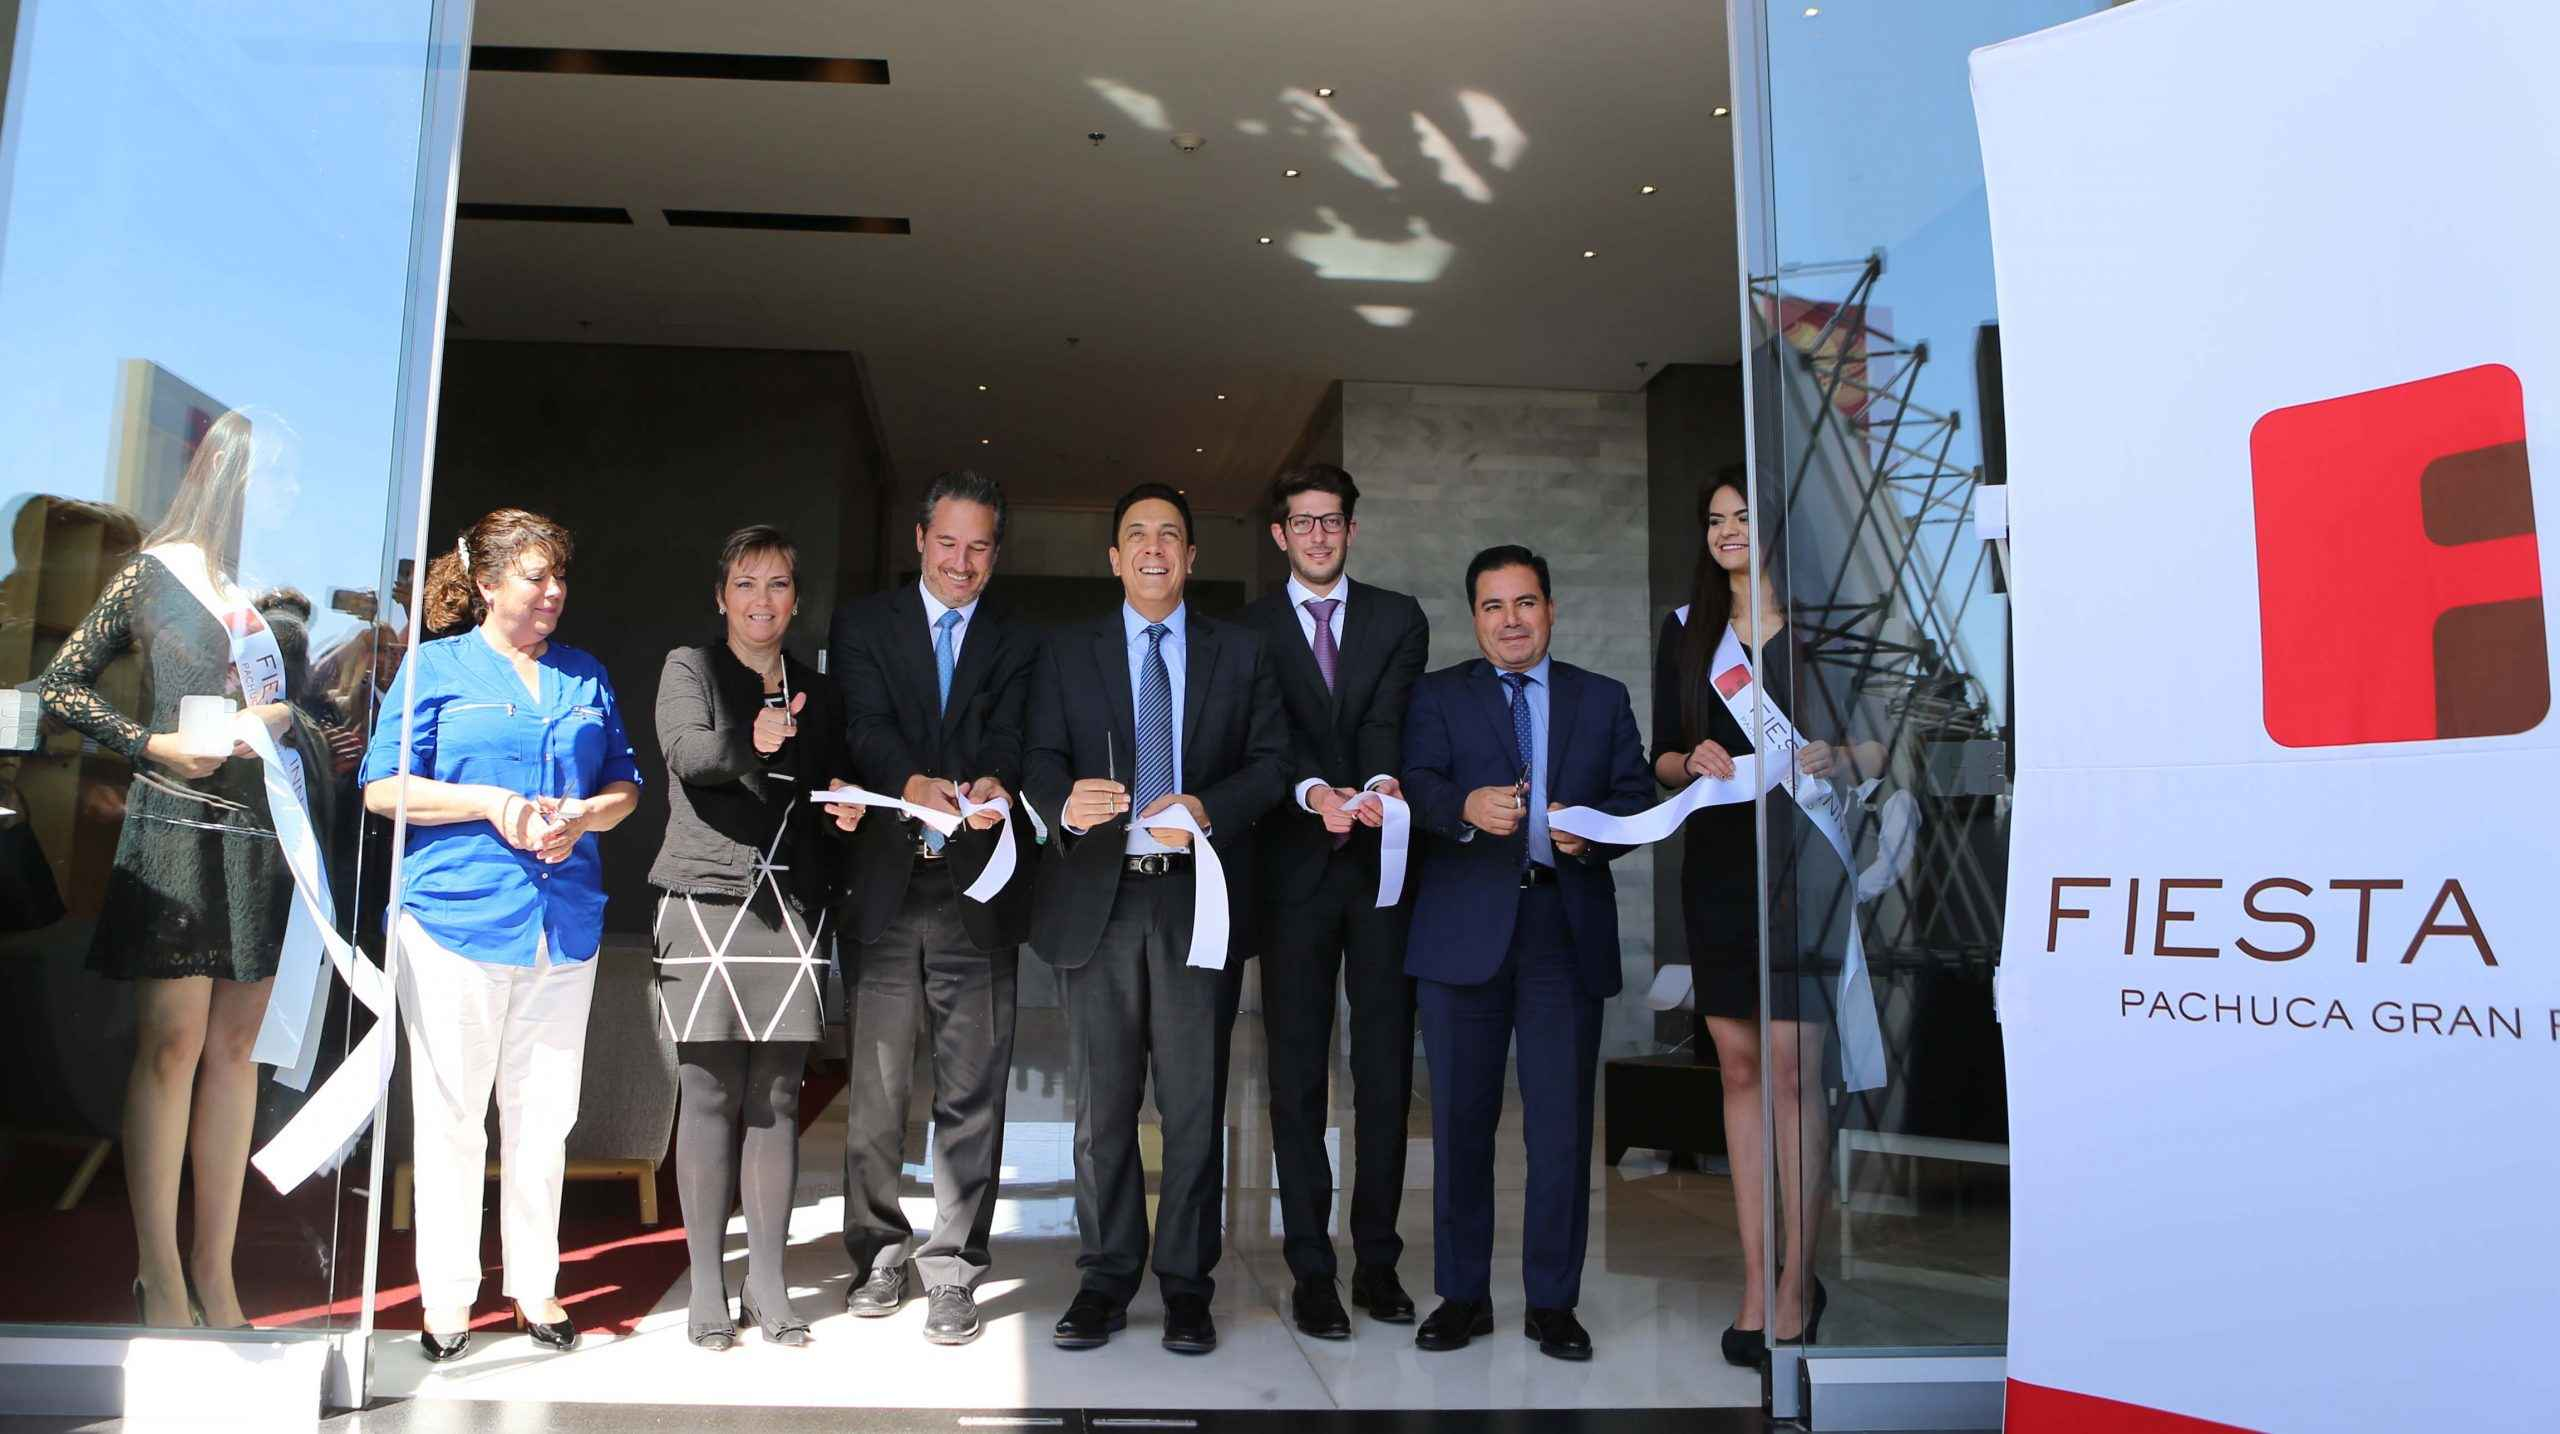 Abre sus puertas Hotel Fiesta Inn Pachuca Gran Patio